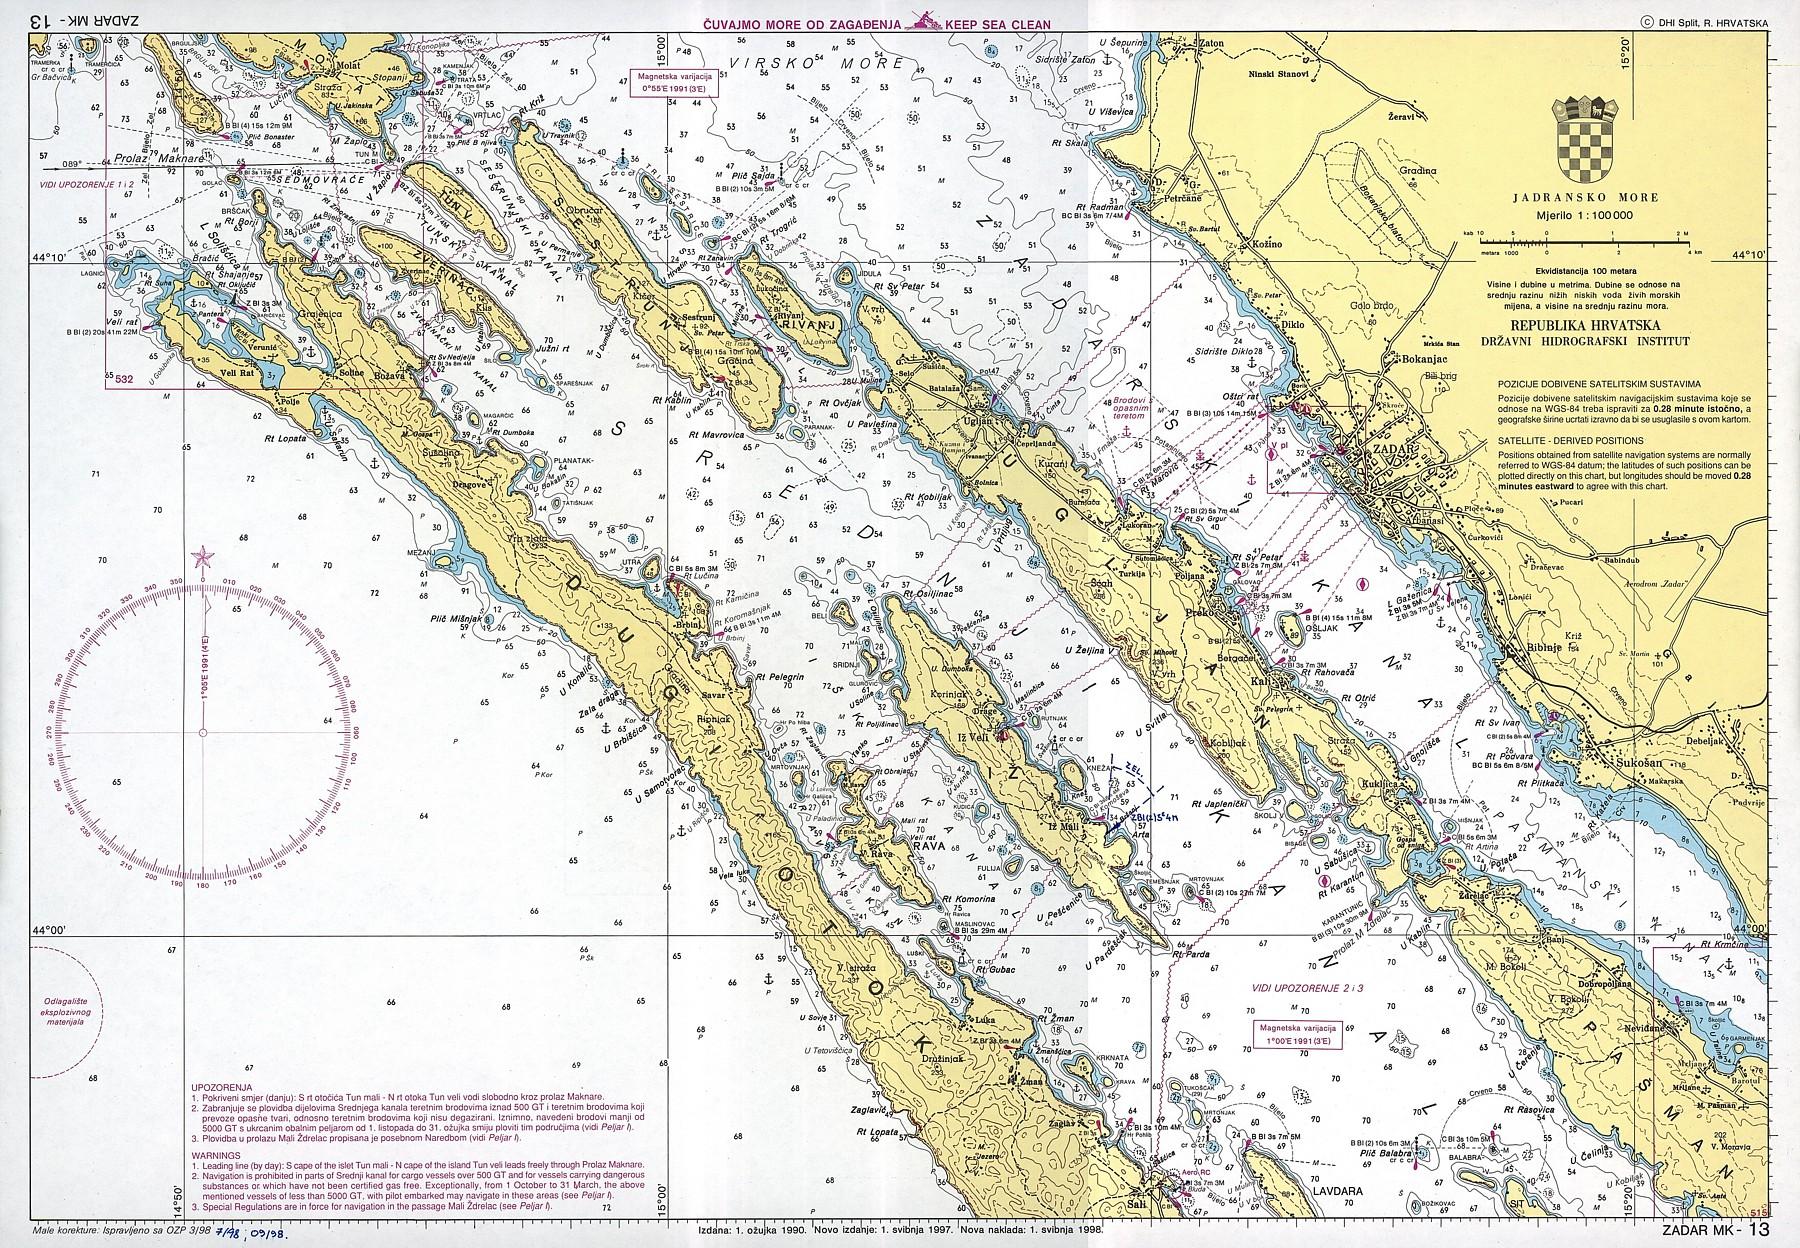 Croatian nautical maps - Vakance charter